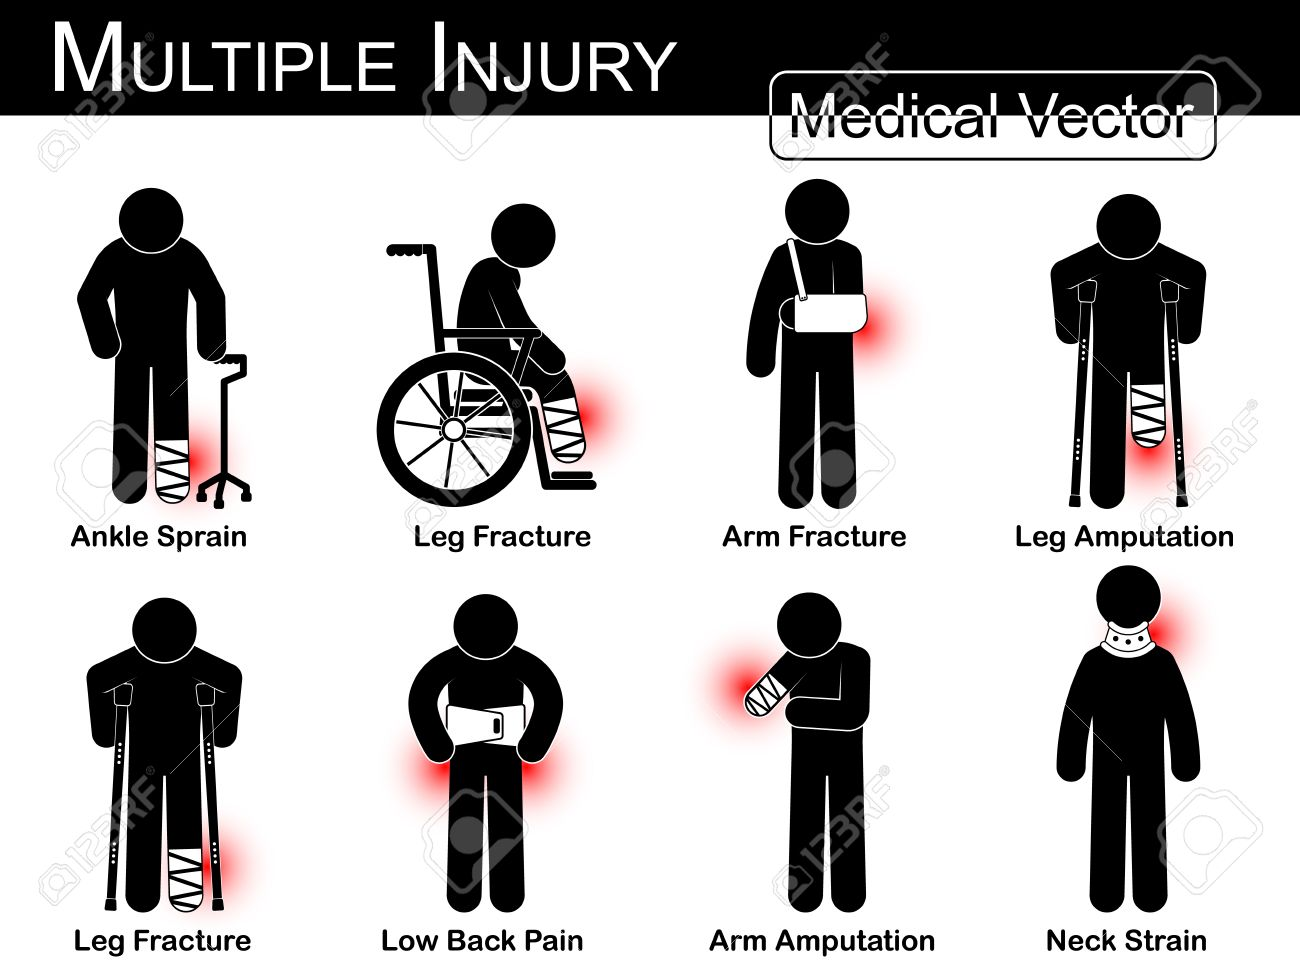 https://i0.wp.com/previews.123rf.com/images/stockdevil/stockdevil1506/stockdevil150600028/41868084-Multiple-injury-set-Ankle-sprain-Leg-fracture-Arm-fracture-Leg-amputation-Leg-fracture-Low-back-pain-Stock-Vector.jpg